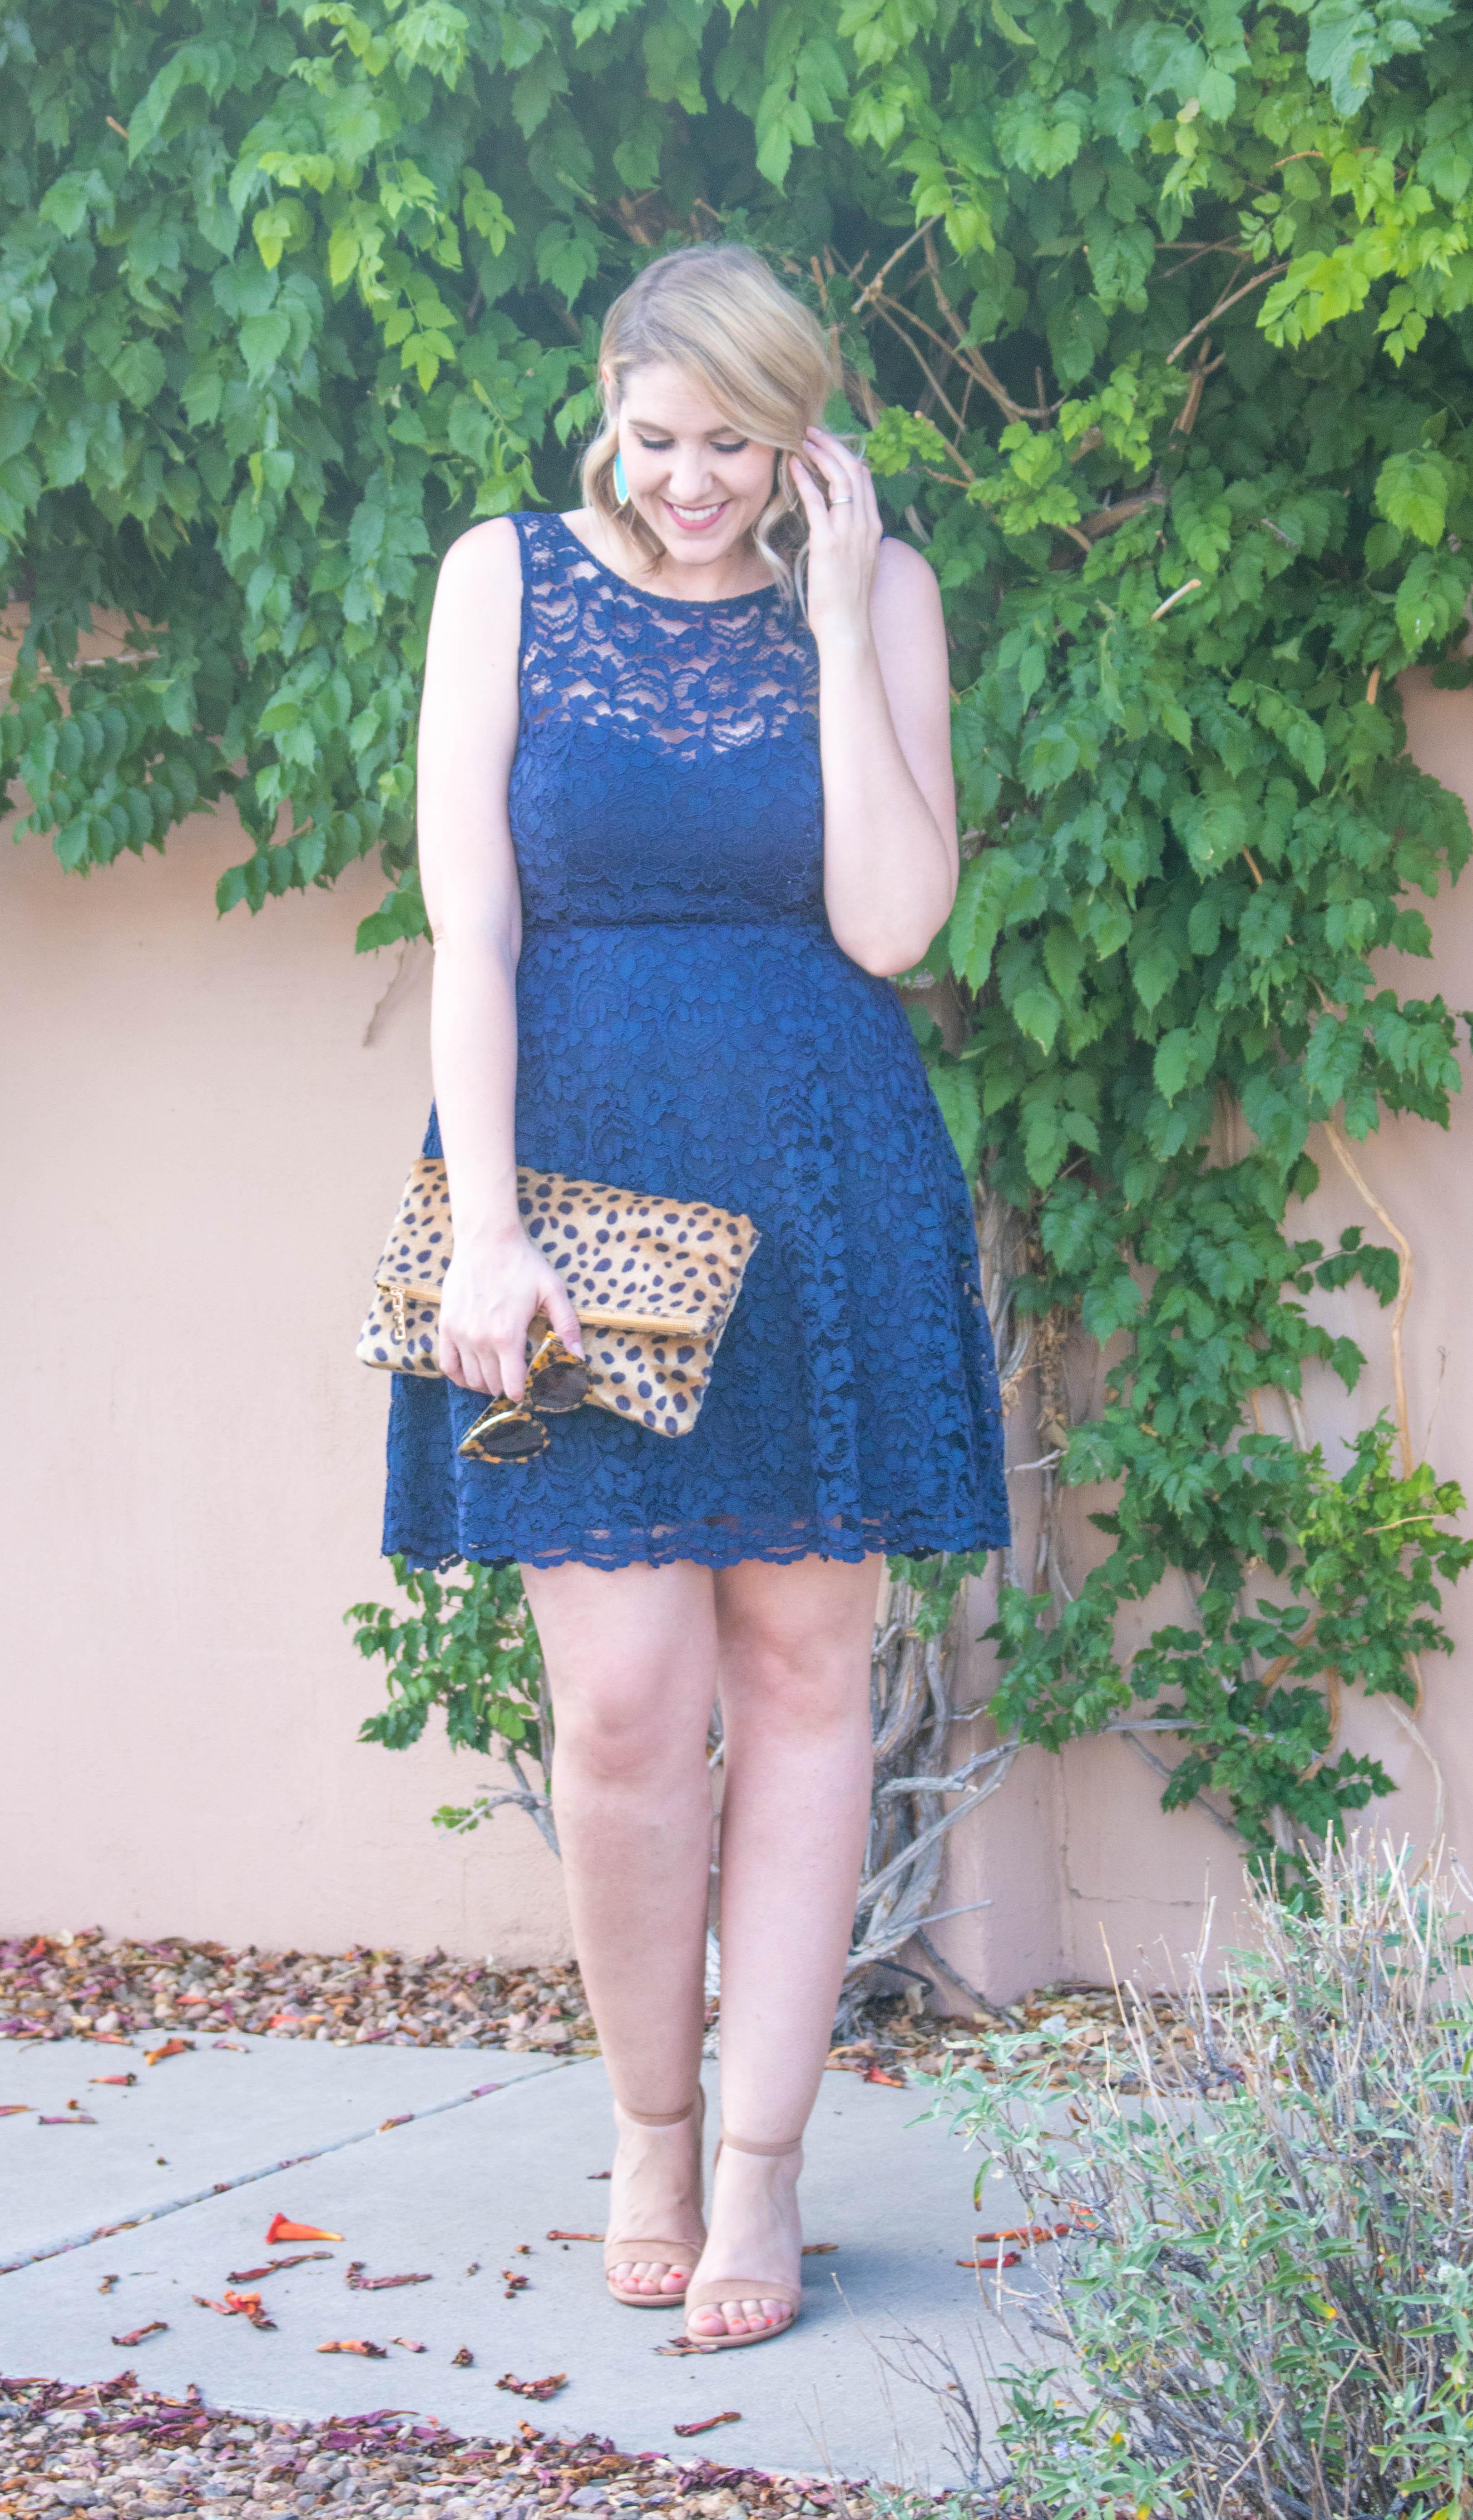 wedding guest outfit for summer #wedding #weddingguest #lacedress